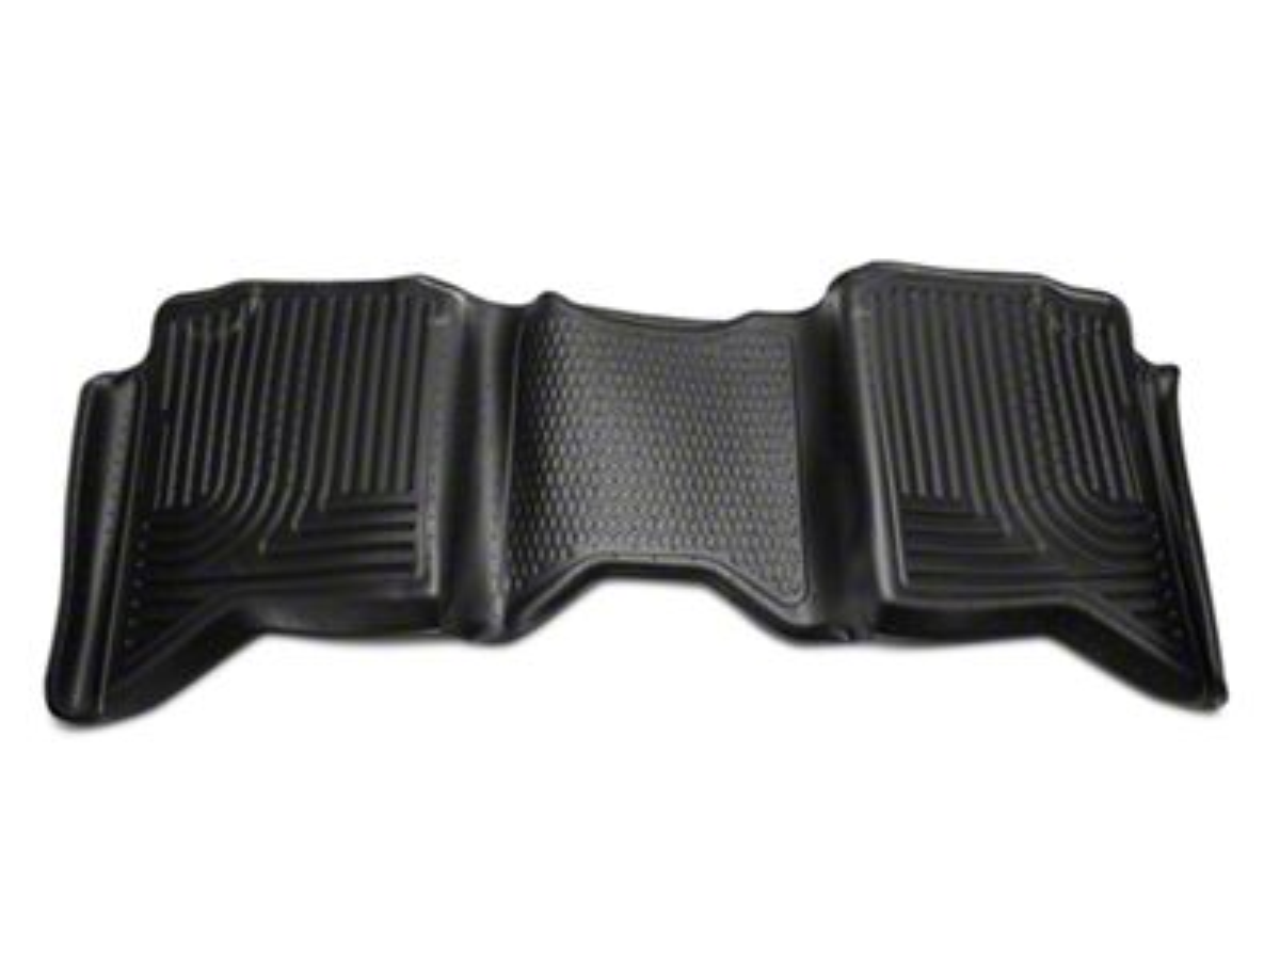 Husky WeatherBeater 2nd Seat Floor Liner - Black (09-18 RAM 1500 Quad Cab, Crew Cab)